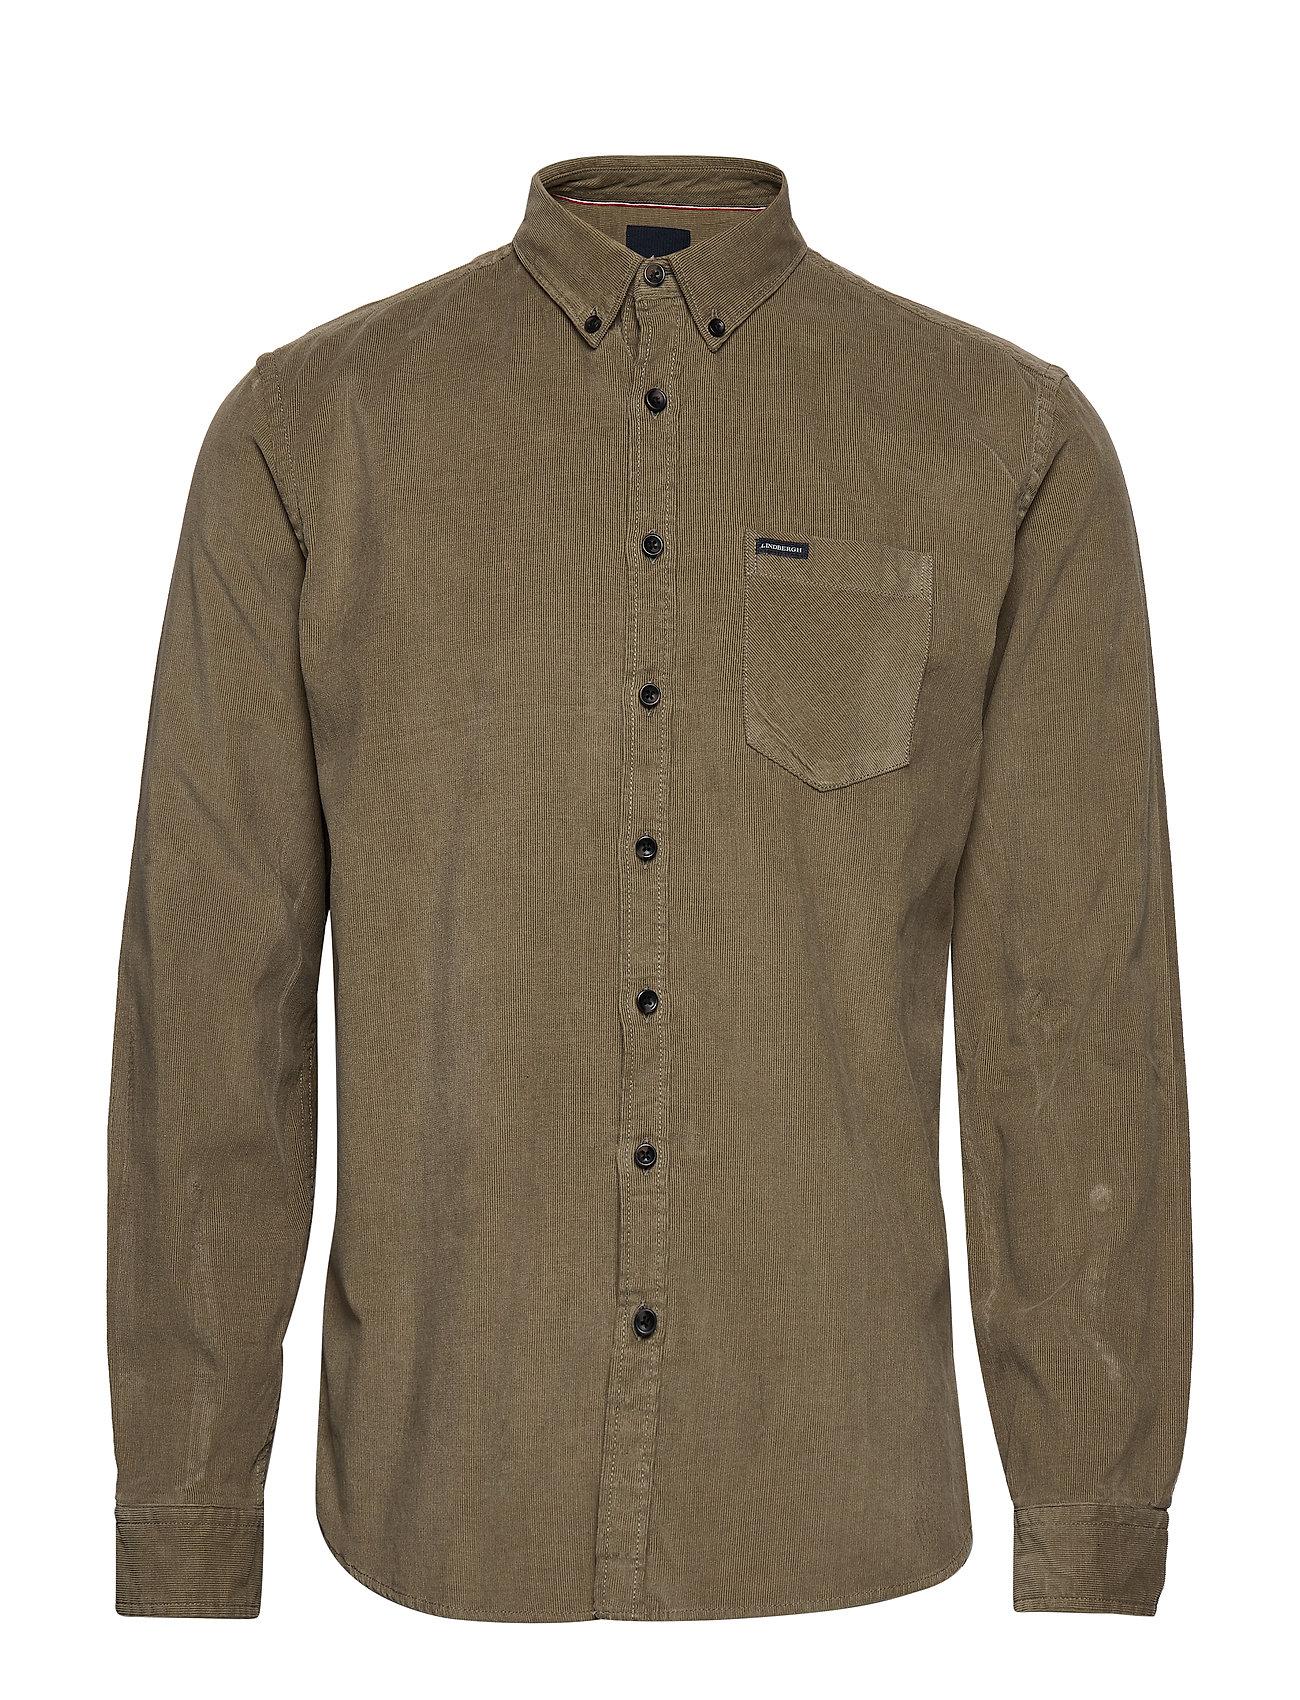 Lindbergh Corduroy L/S shirt - DARK SAND